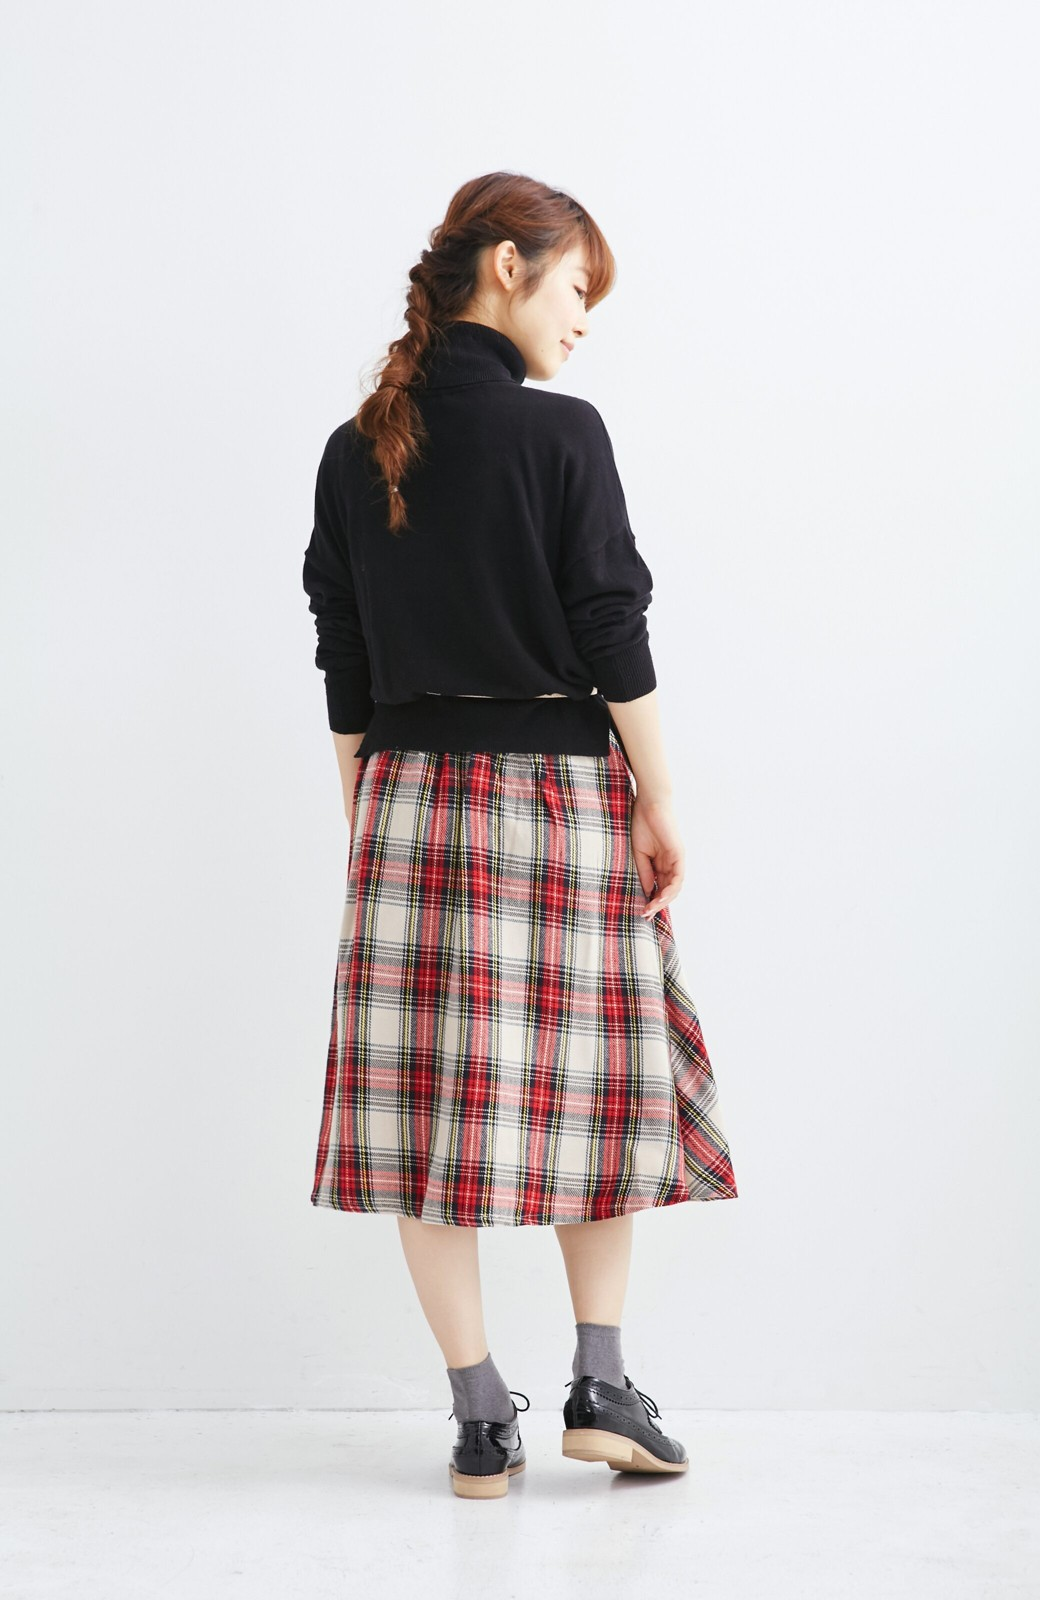 haco! haco.FACTORY スクールチェックフレアースカート <レッド系その他>の商品写真5